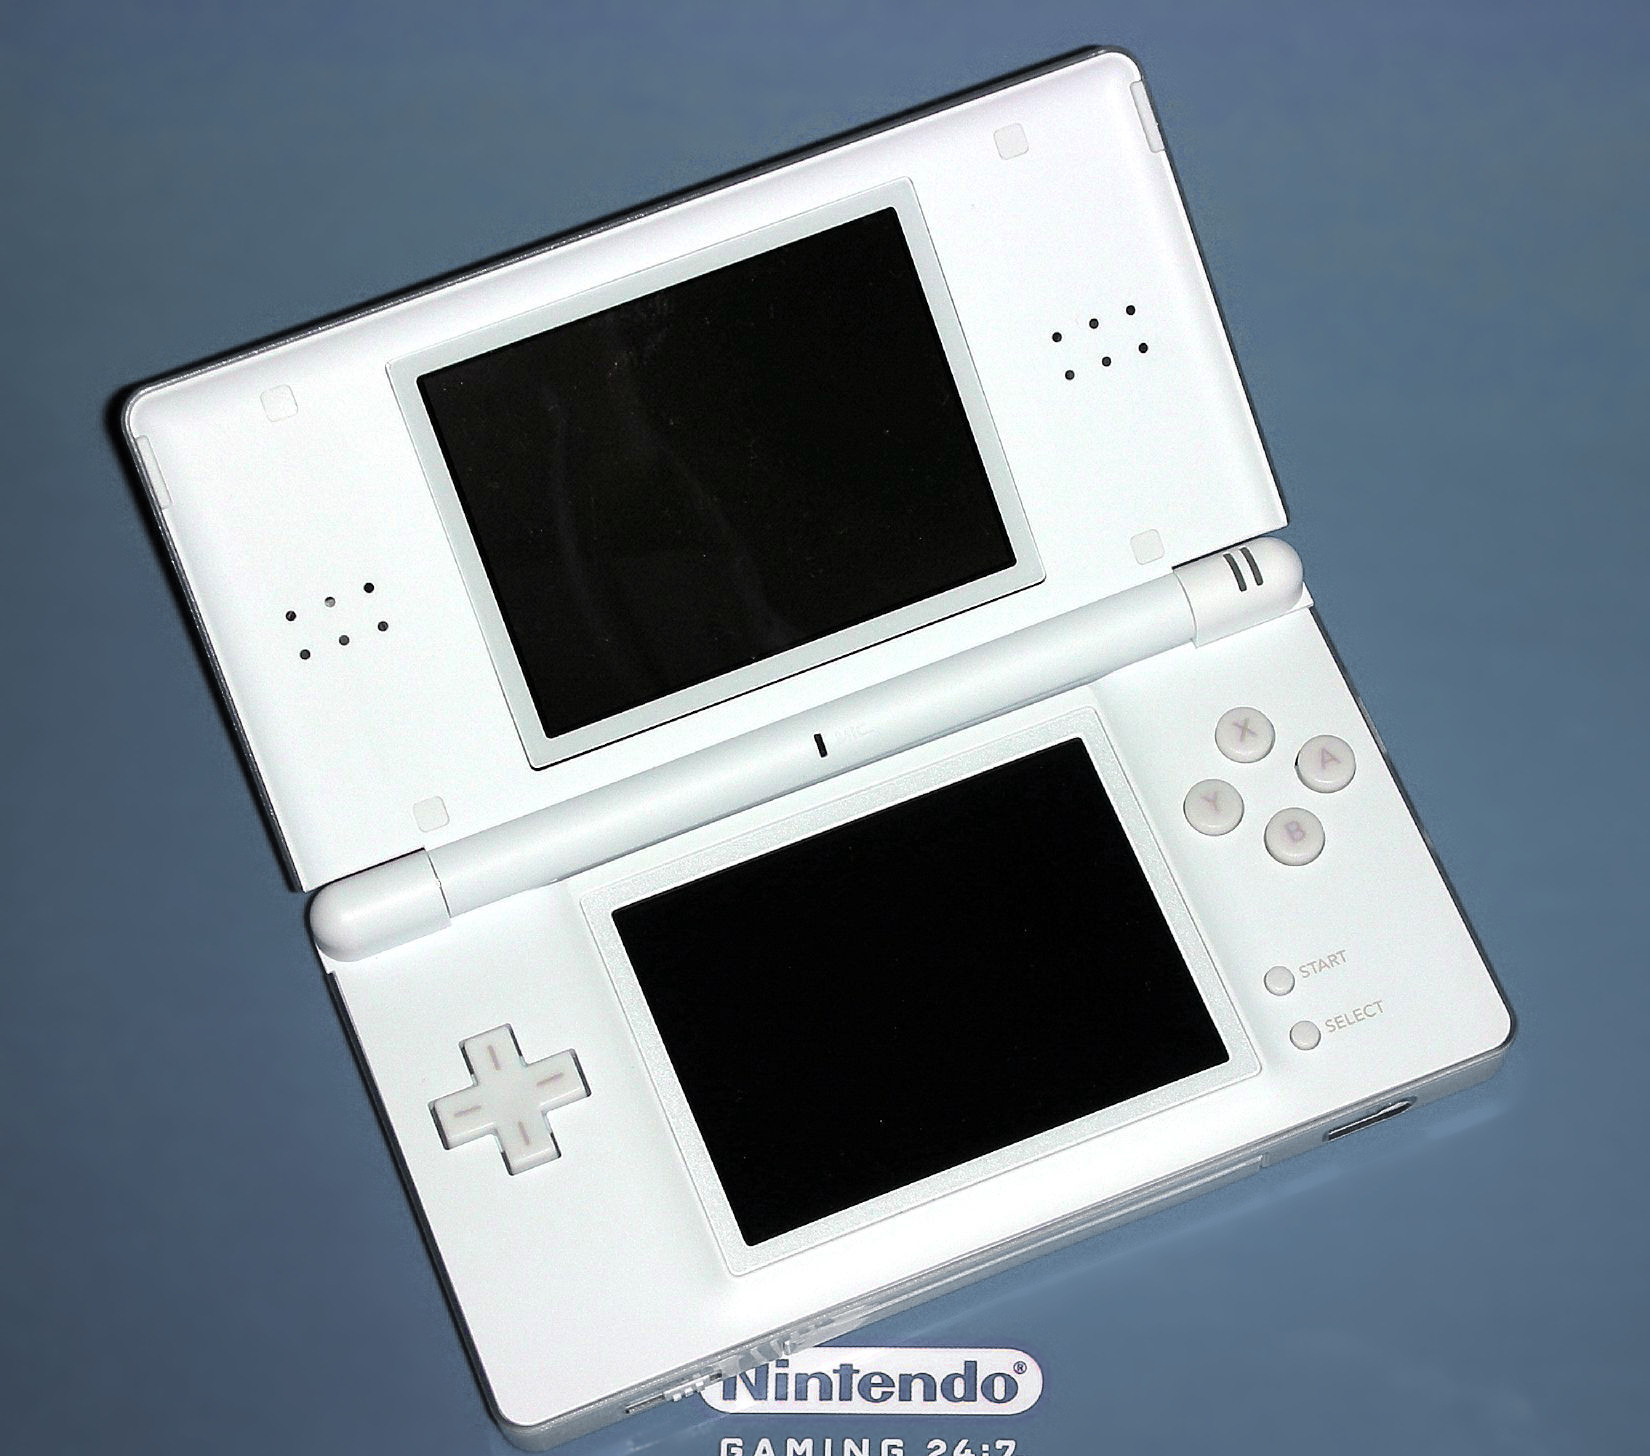 File:Nintendo ds2.jpg - Wikimedia Commons